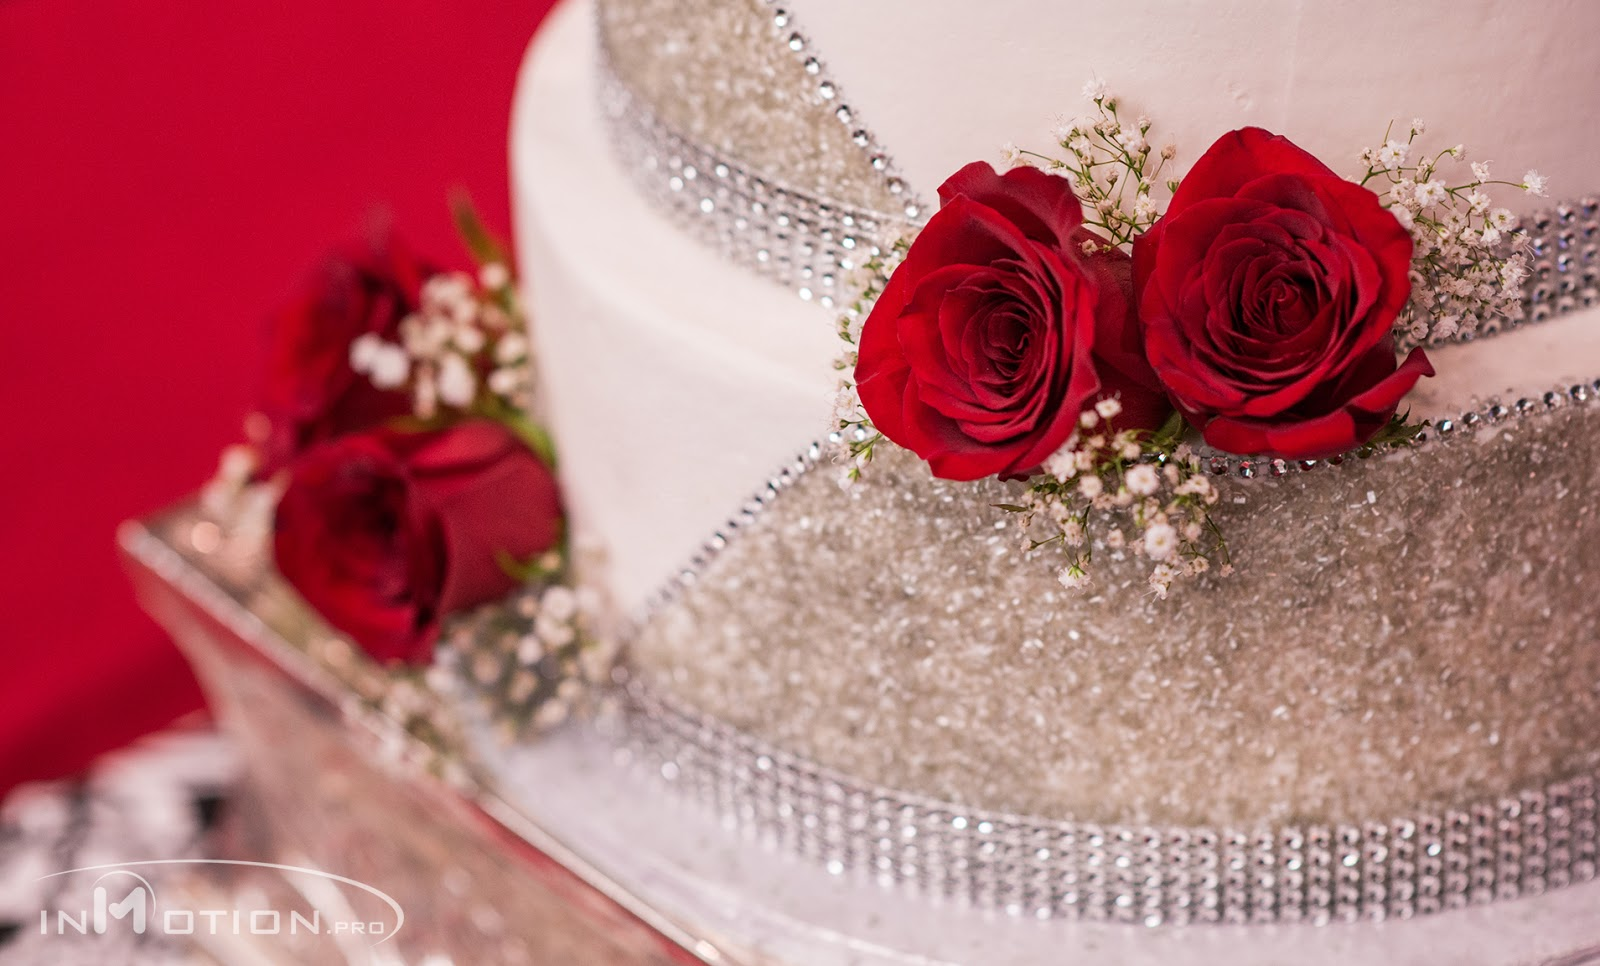 Detail Shots Wedding Cake Red Roses On